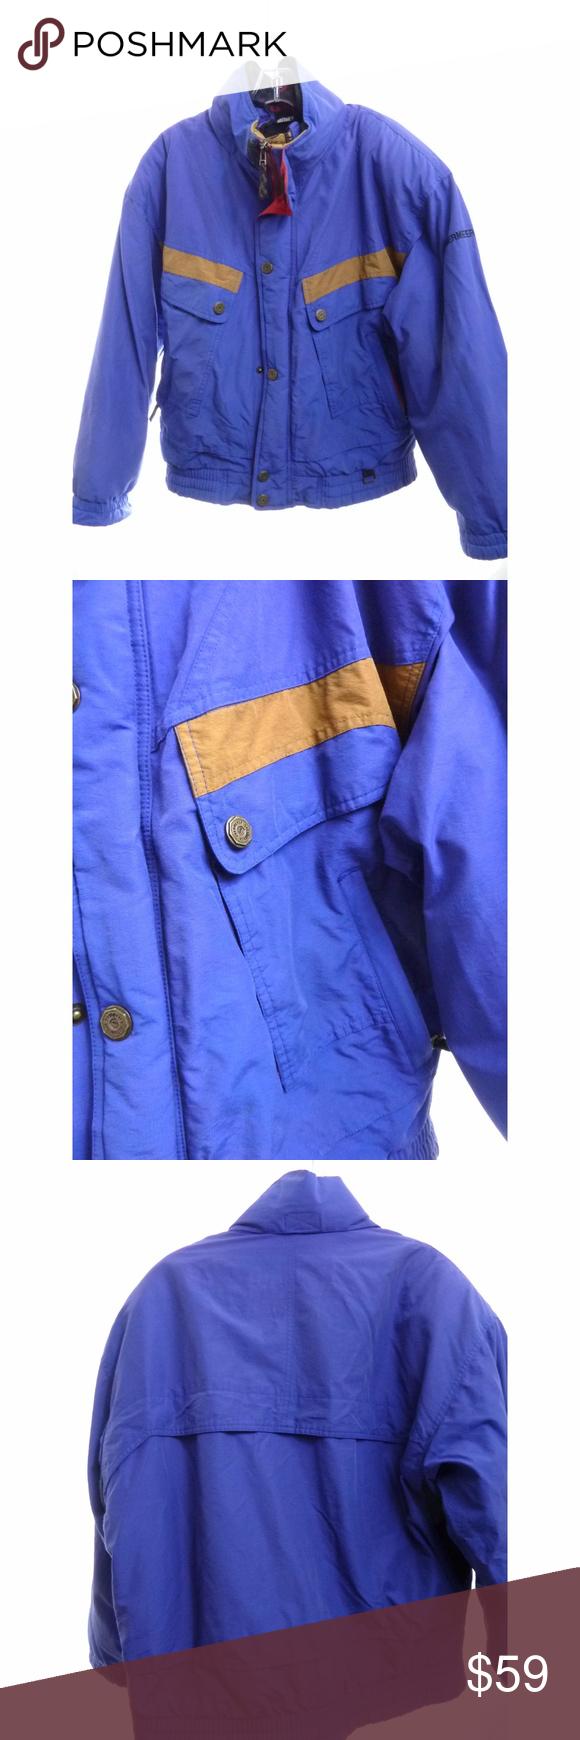 Mens obermeyer winter jacket with fleece lining m vintage obermeyer